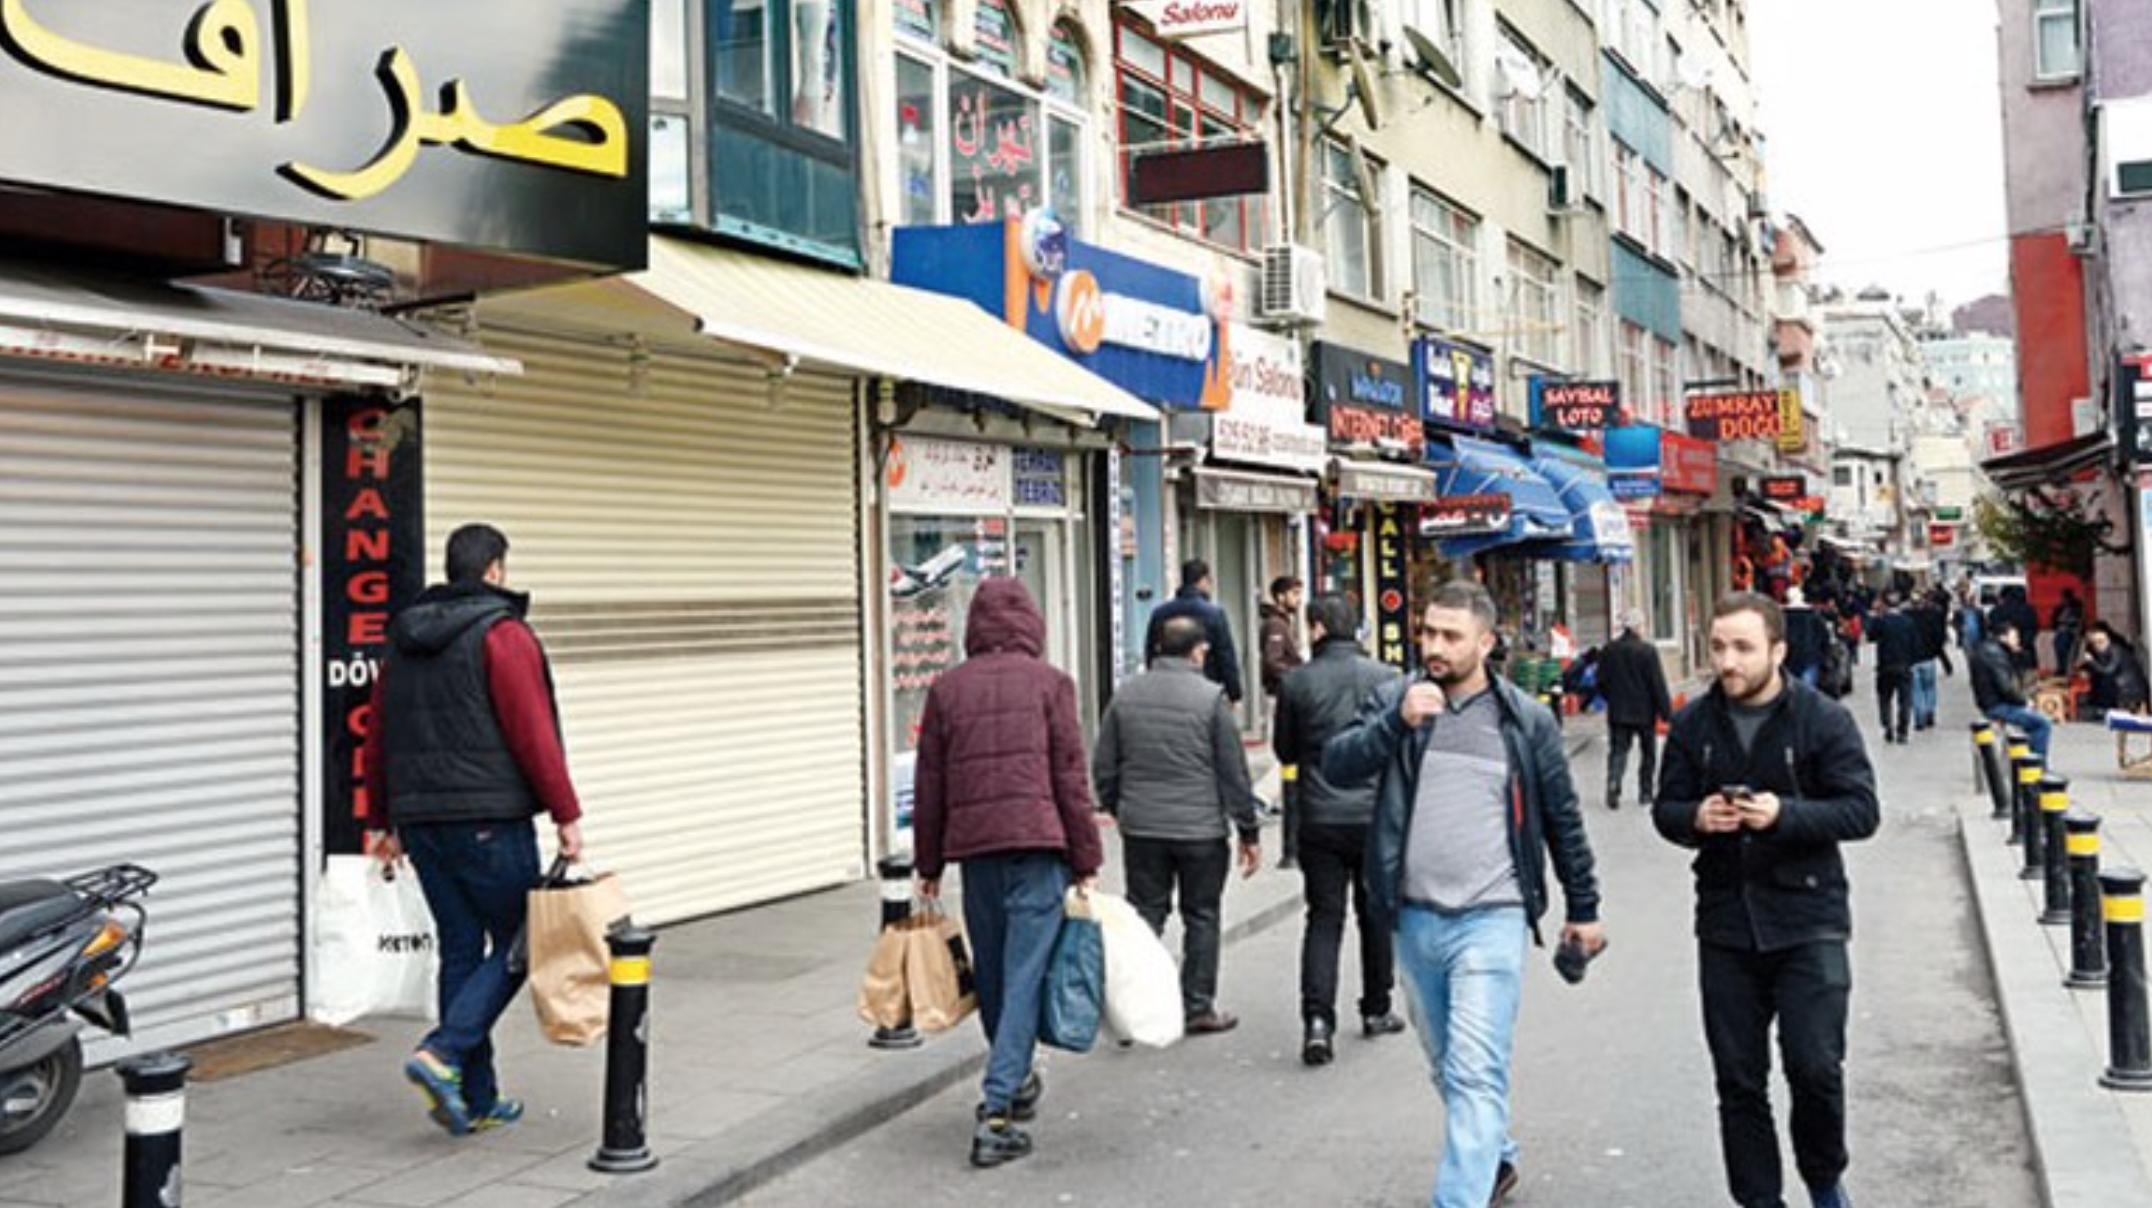 A Syrian diasporic space, Fatih, Istanbul